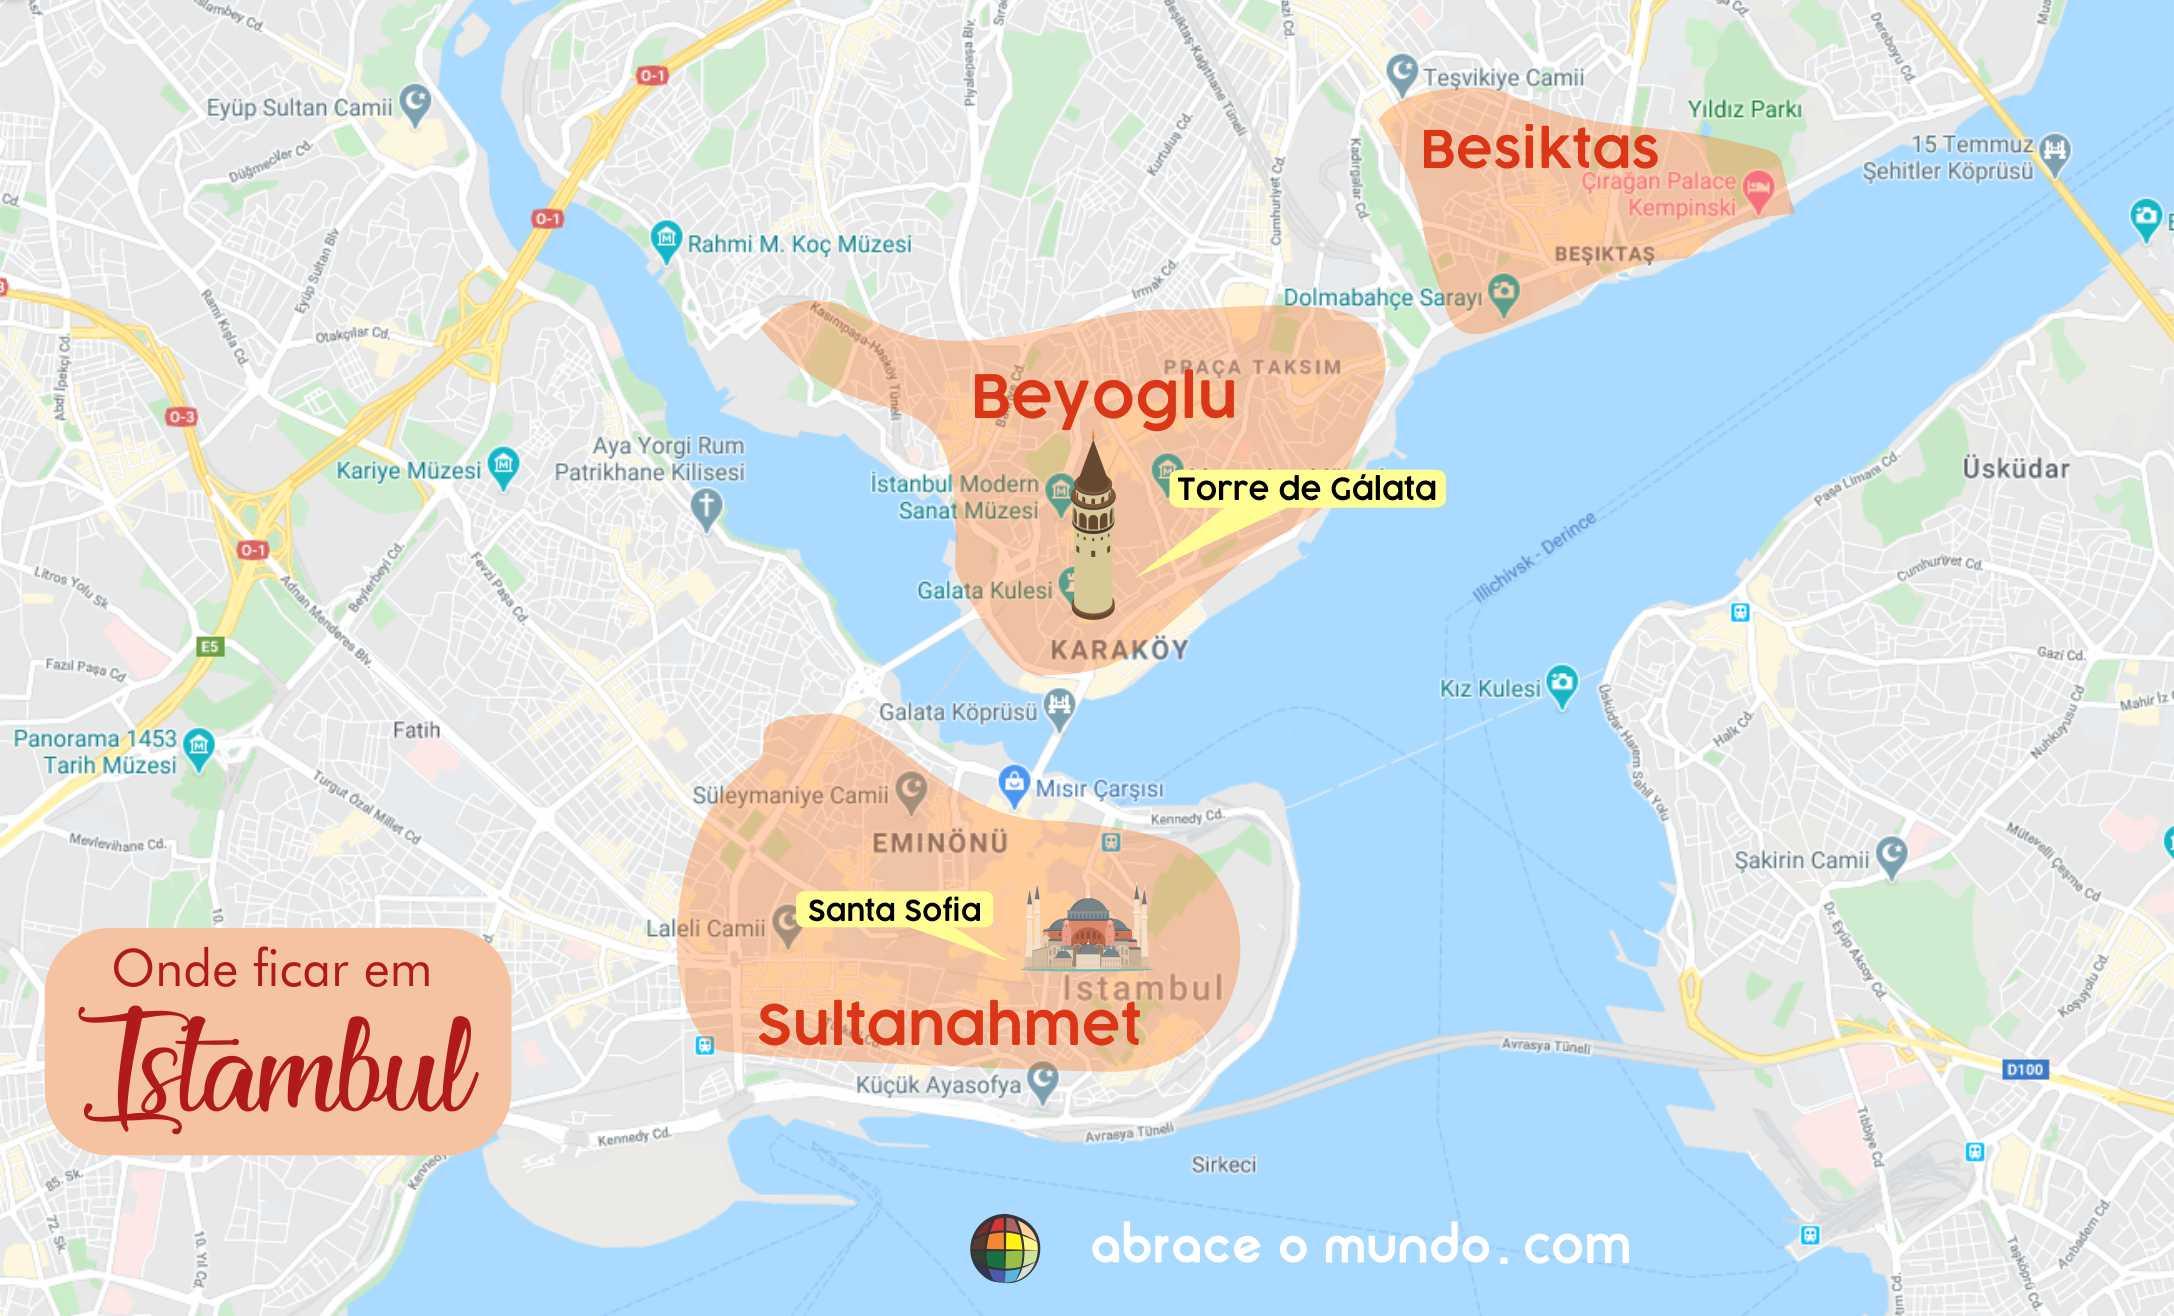 onde ficar em istambul